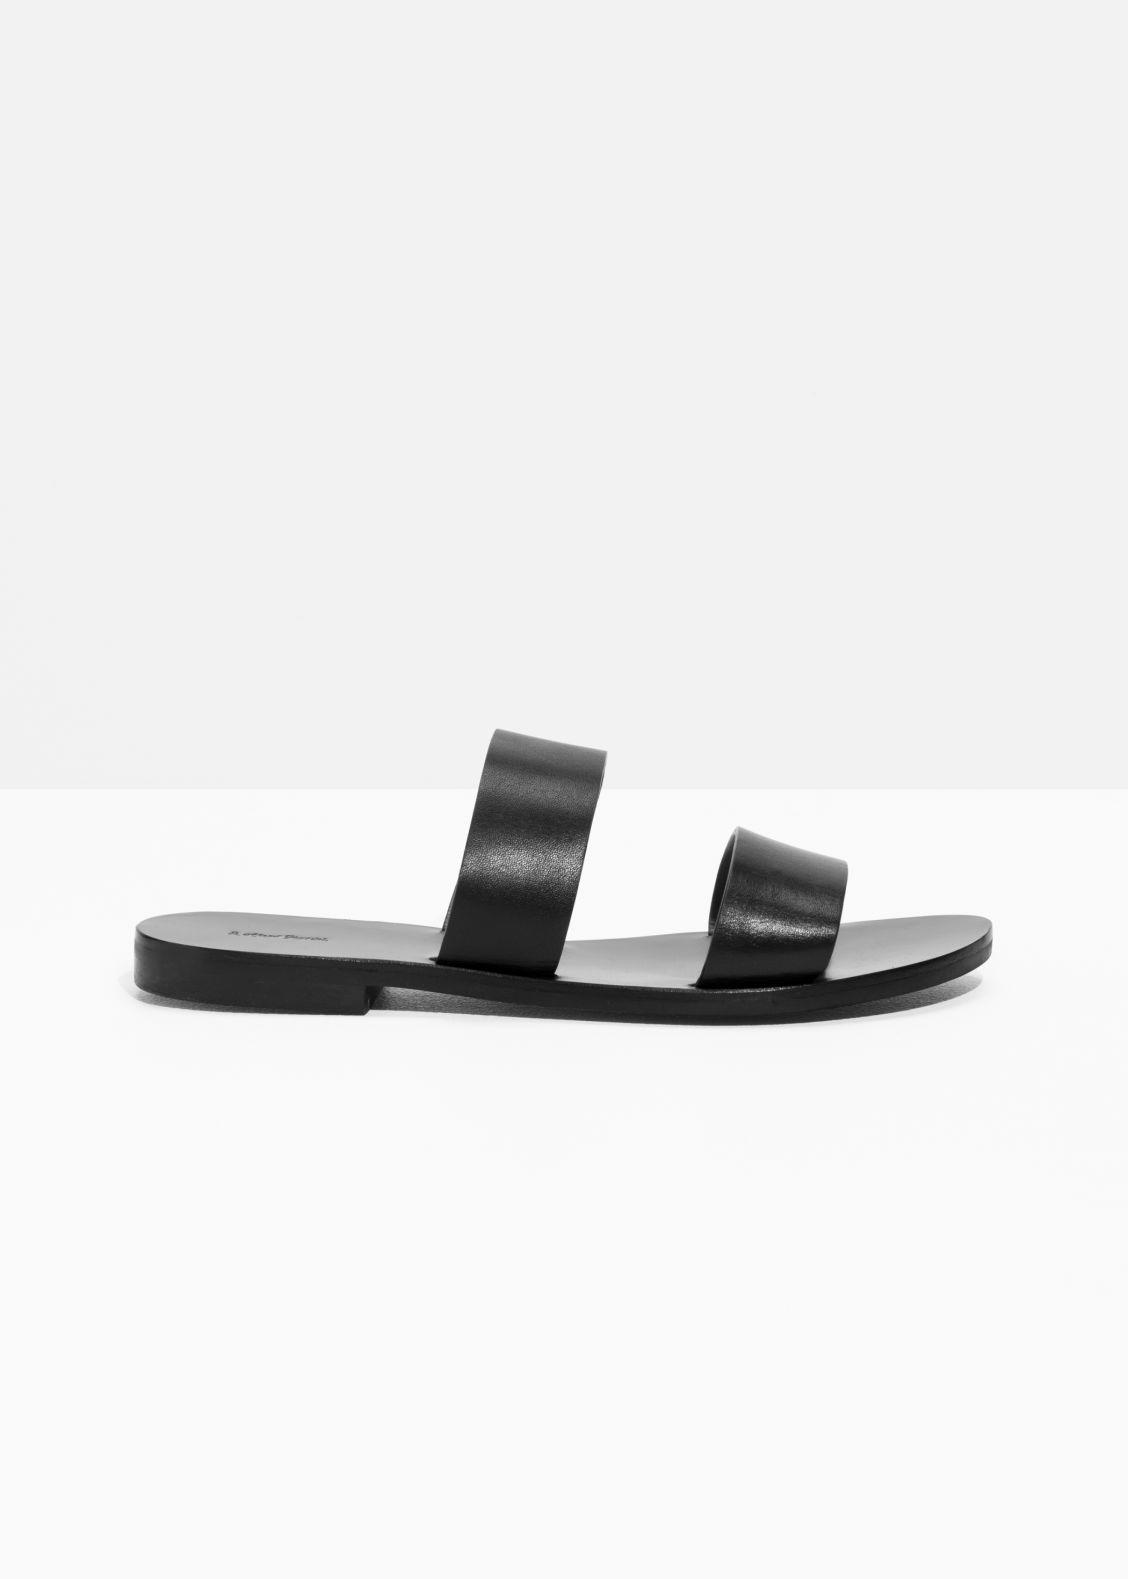 Venta de alta calidad en línea & OTHER STORIES Two Strap Sandals - Black Opción de salida Descuento falso Descuento con Mastercard OocOZcd